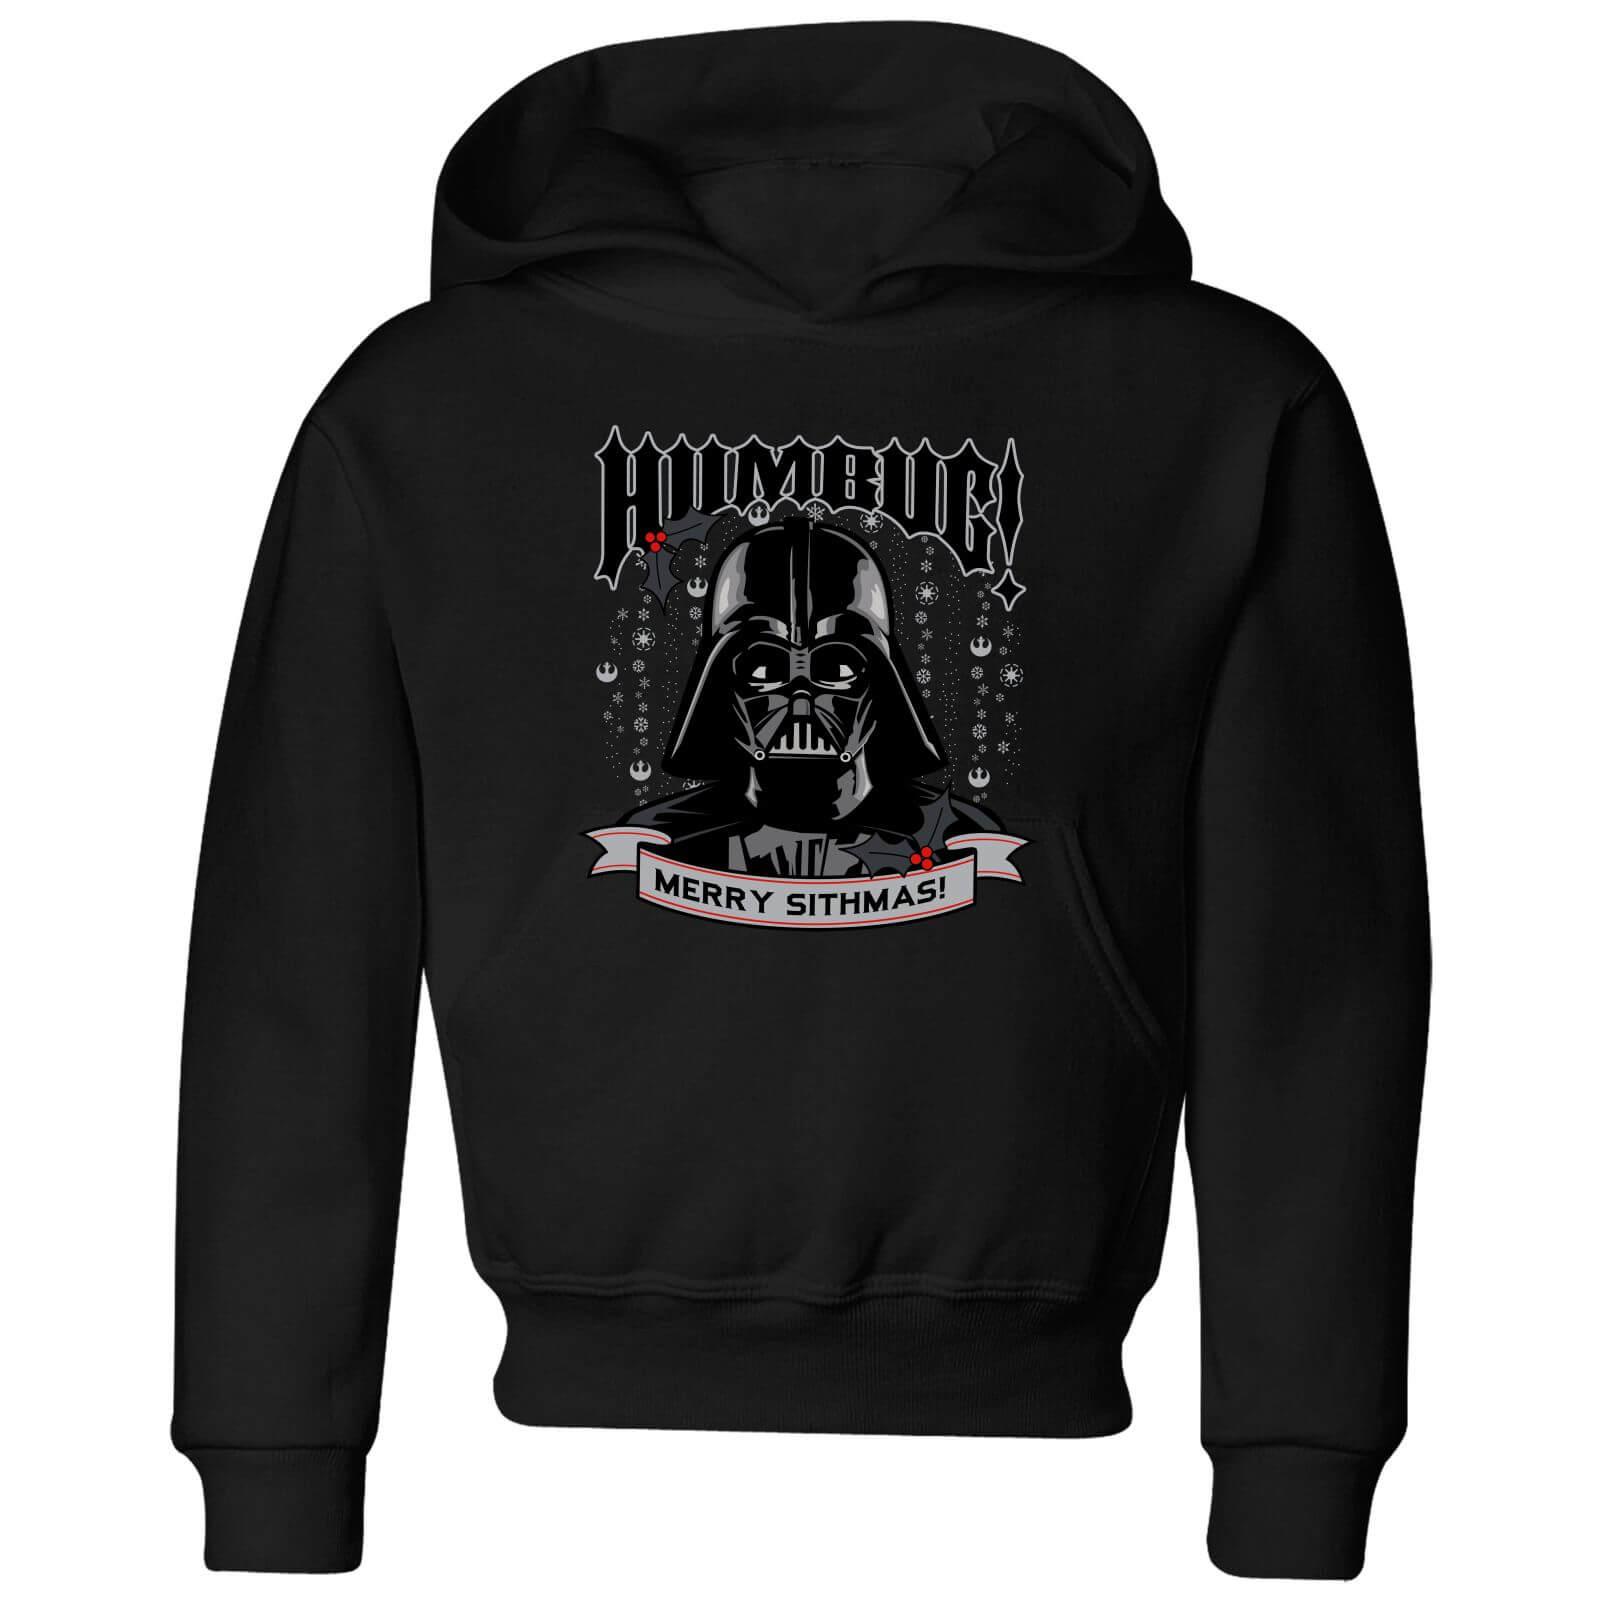 Star Wars Darth Vader Humbug Kids' Christmas Hoodie - Black - 5-6 Jahre - Schwarz